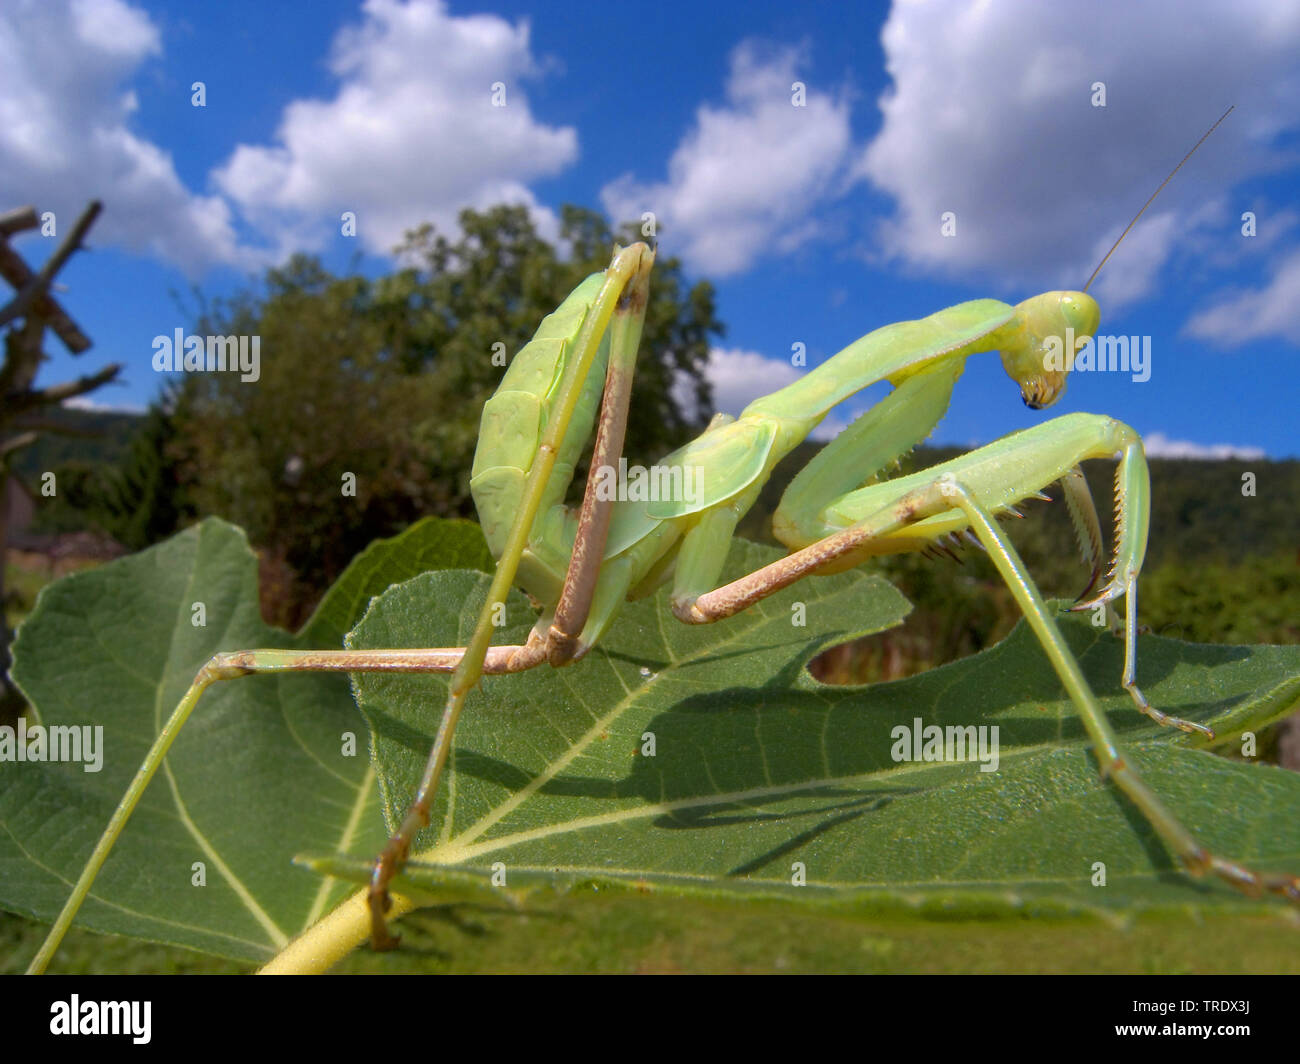 Fangschrecke, Iris oratoria (Iris oratoria), sitzt auf einem Blatt | Mediterranean mantis, iris mantis (Iris oratoria), sitting on a leaf | BLWS511386 - Stock Image